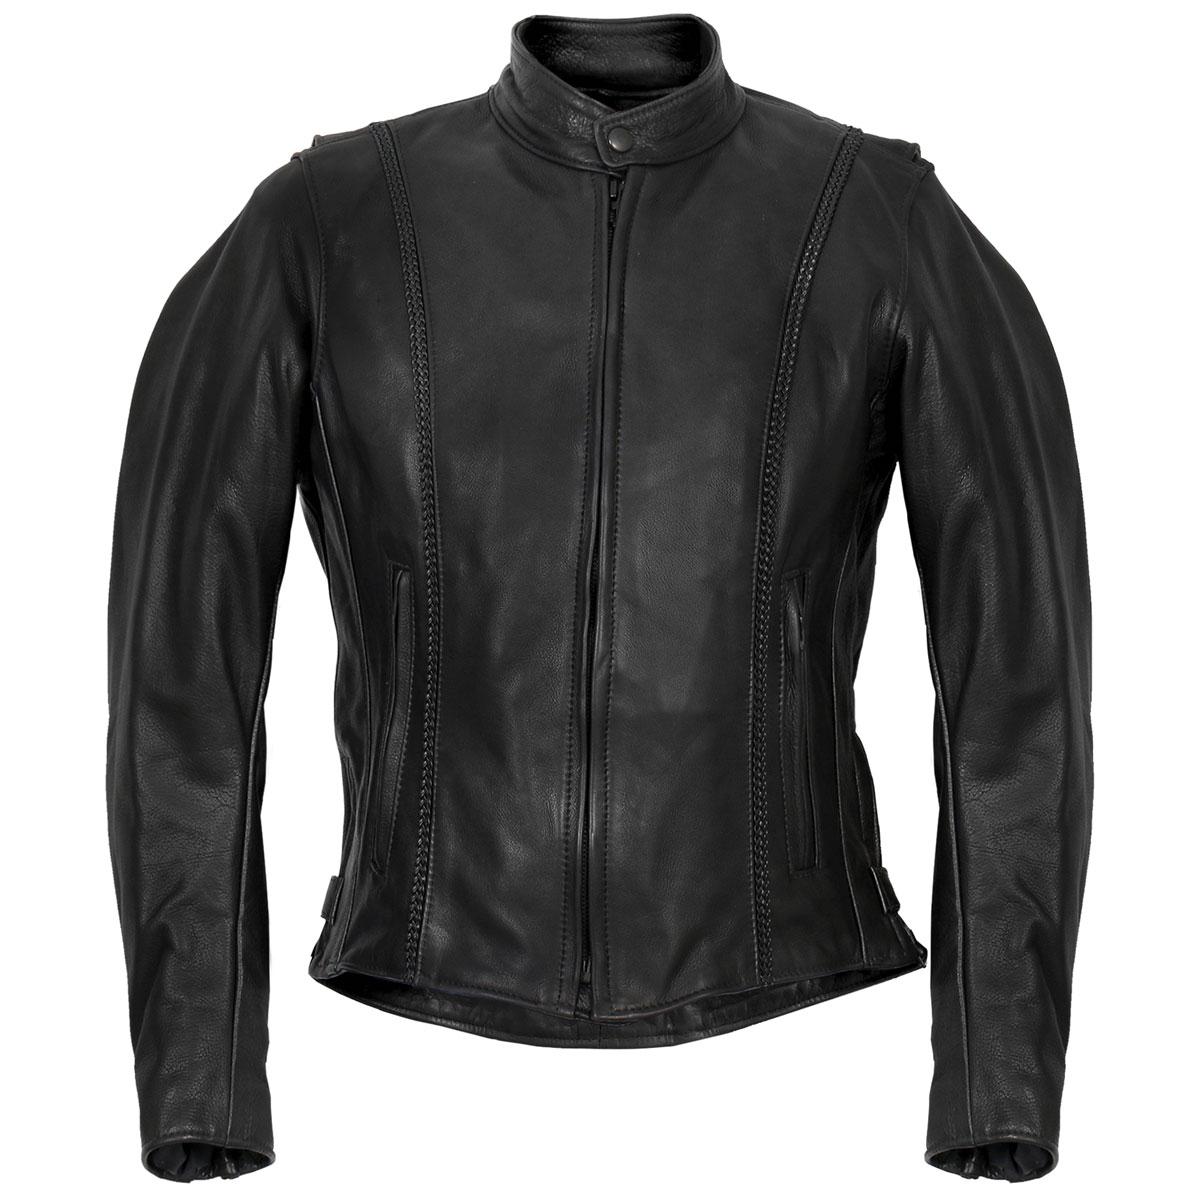 Hot Leathers Women's USA Made Braided Black Leather Jacket